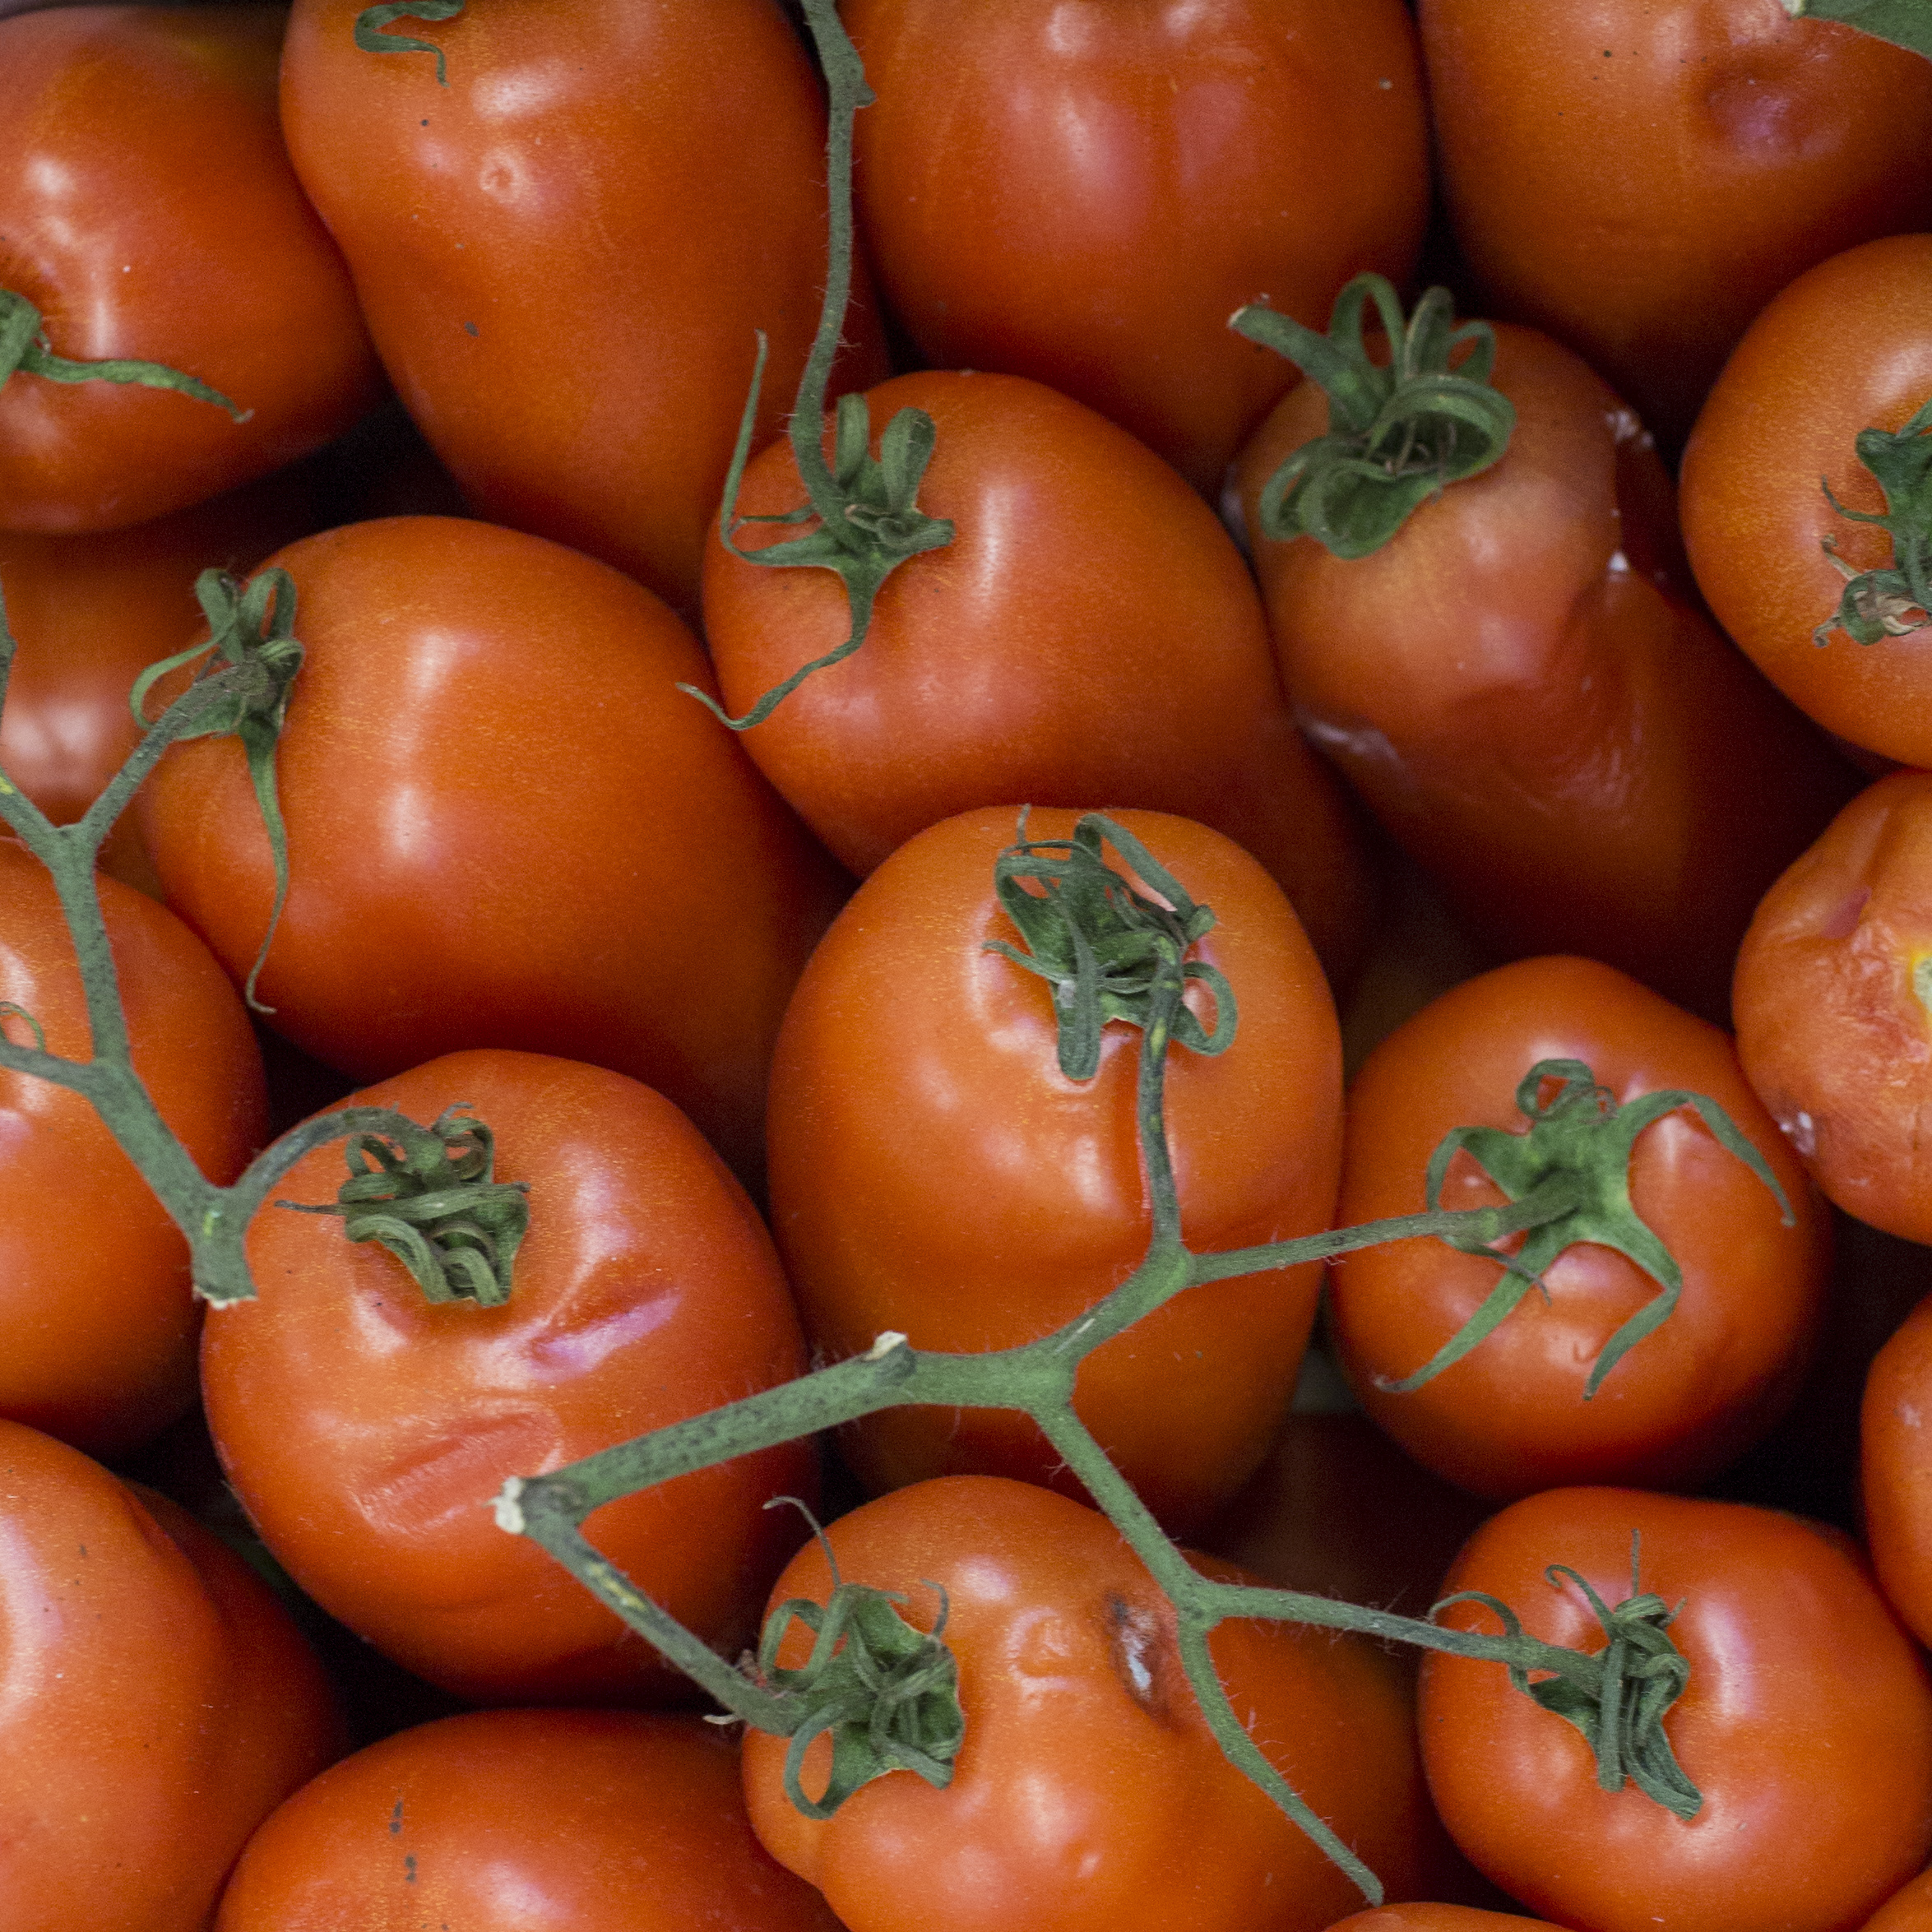 European-Salad-Company-plum-tomatoes.jpg